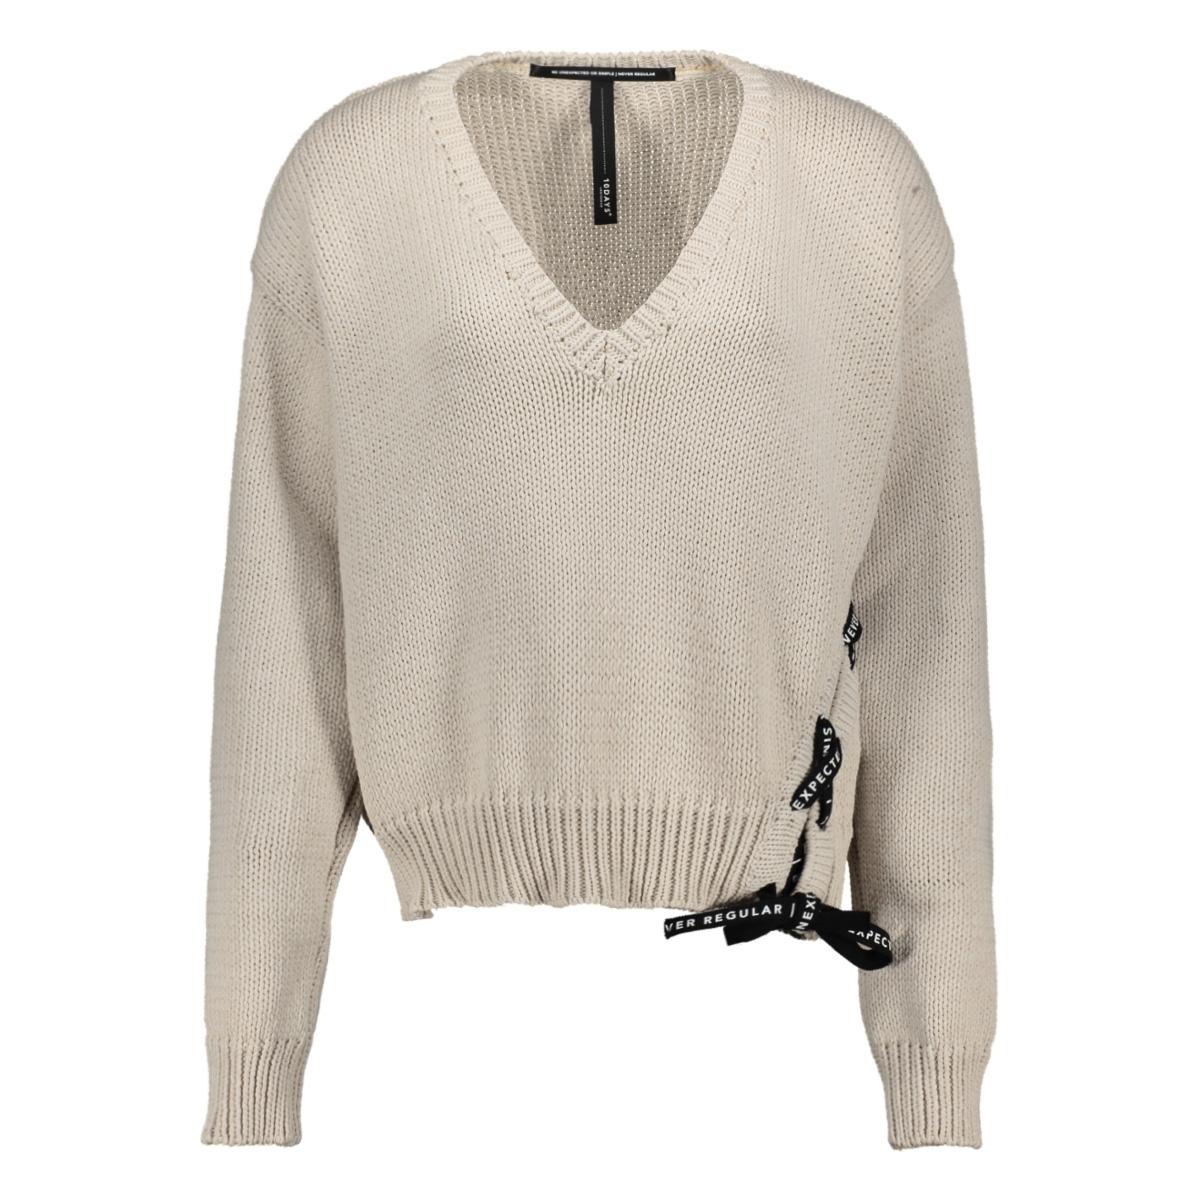 v-neck sweater 20 601 0201 10 days trui 1067 white sand